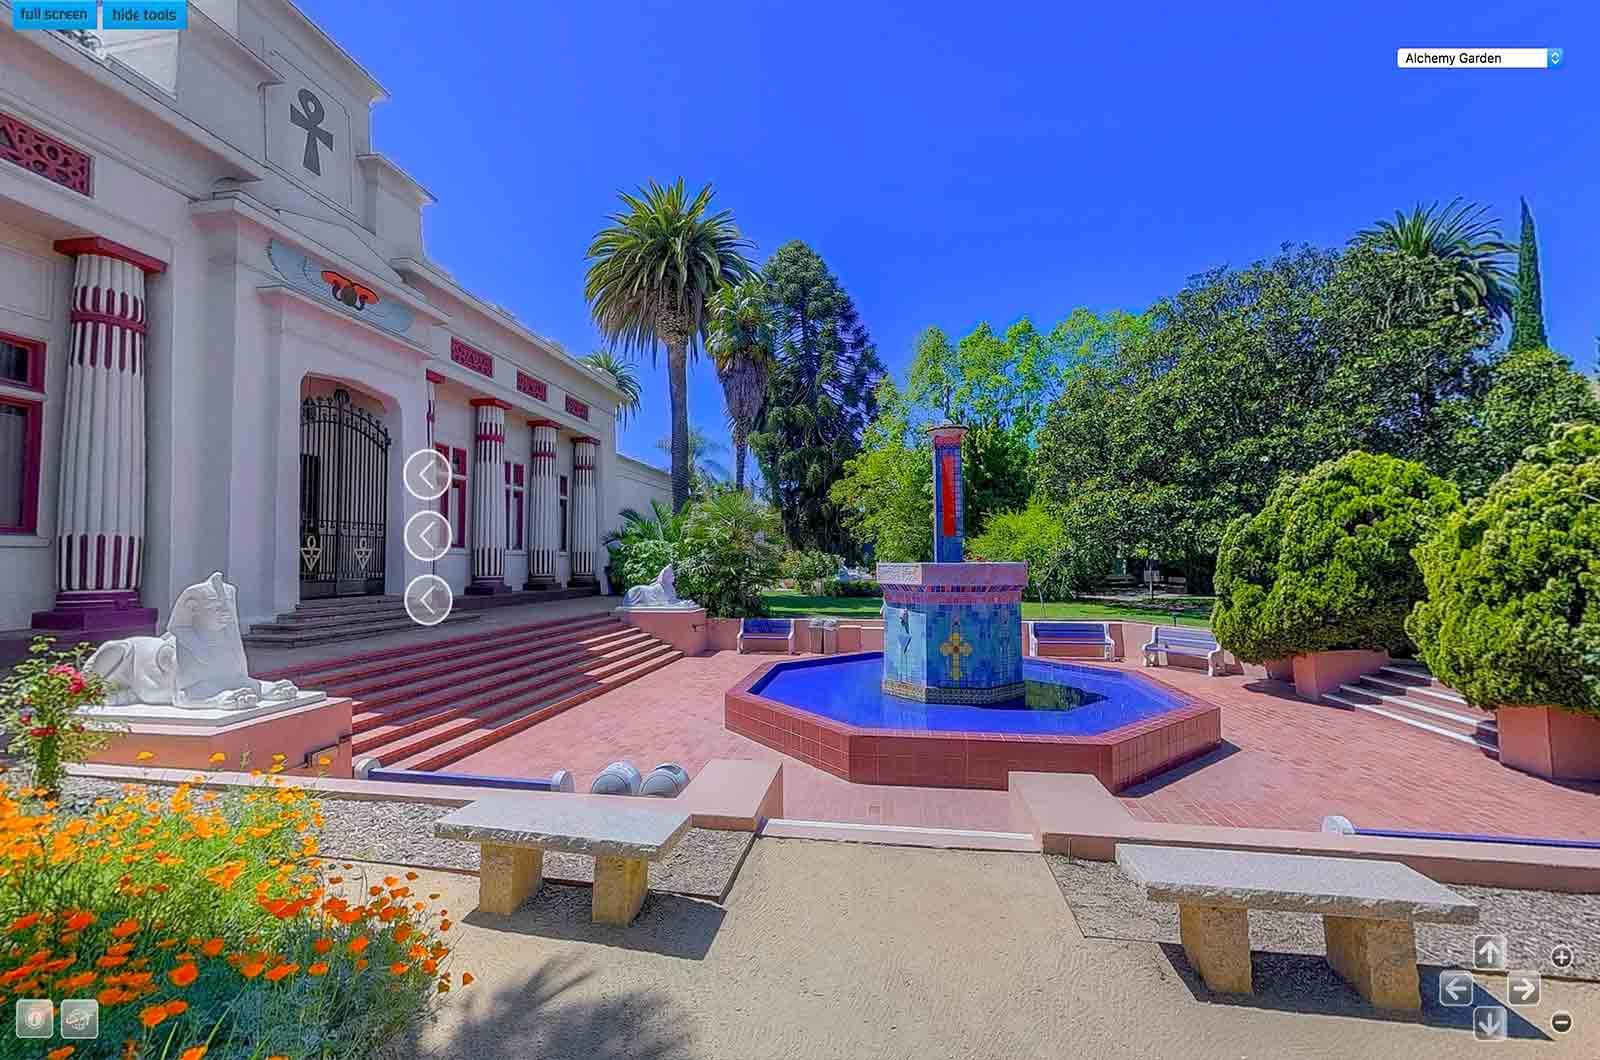 Commercial-Real-Estate-Virtual-Tours-Museum-Virtual-Tours